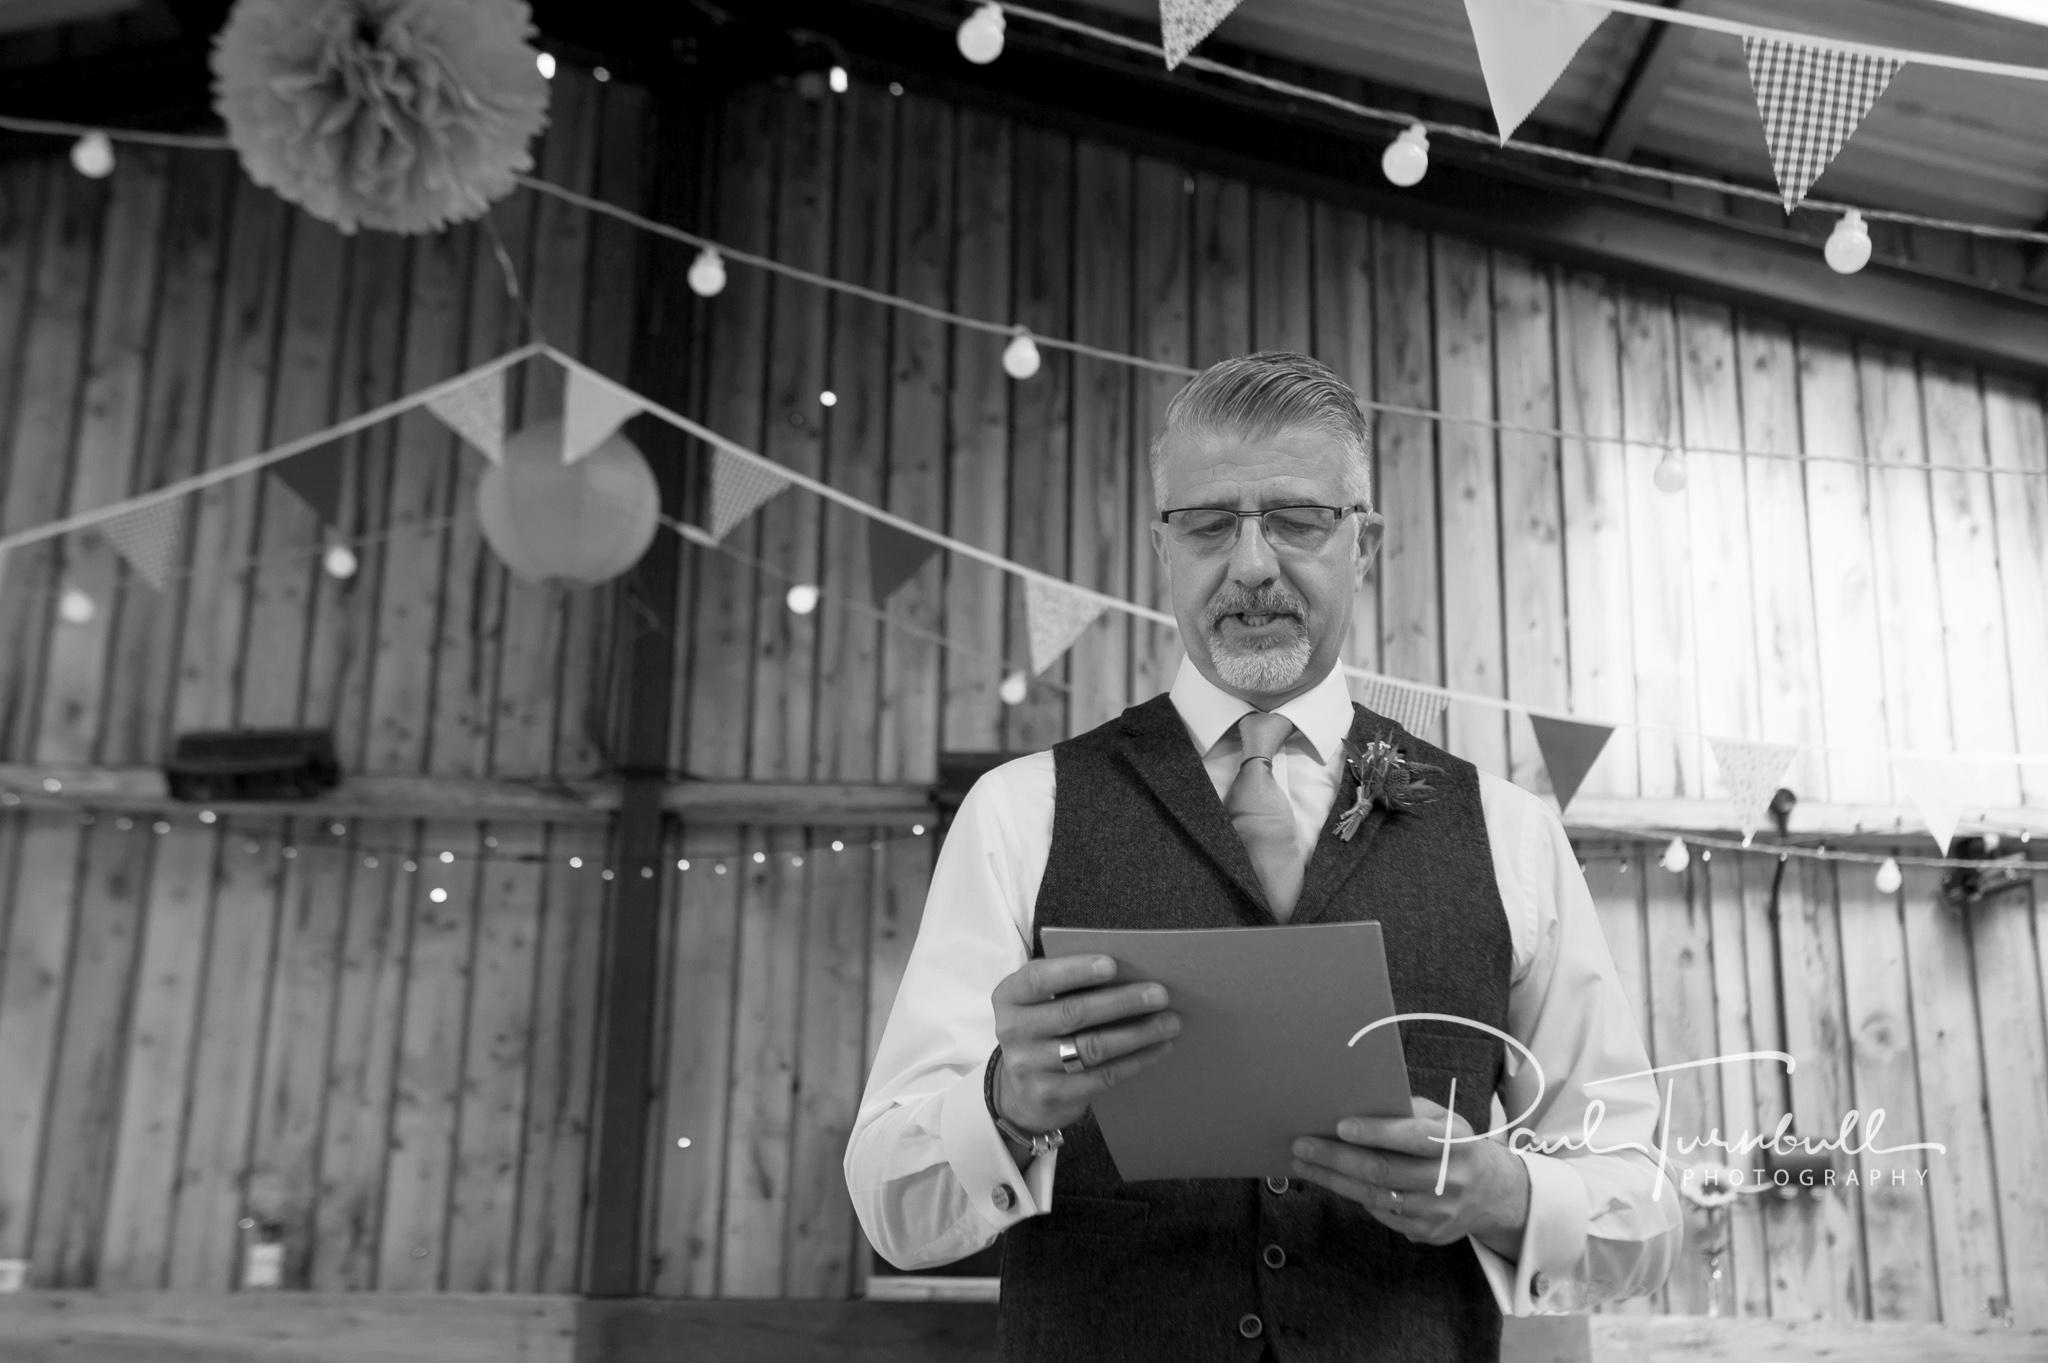 wedding-photographer-hilltop-farm-ilton-yorkshire-039.jpg